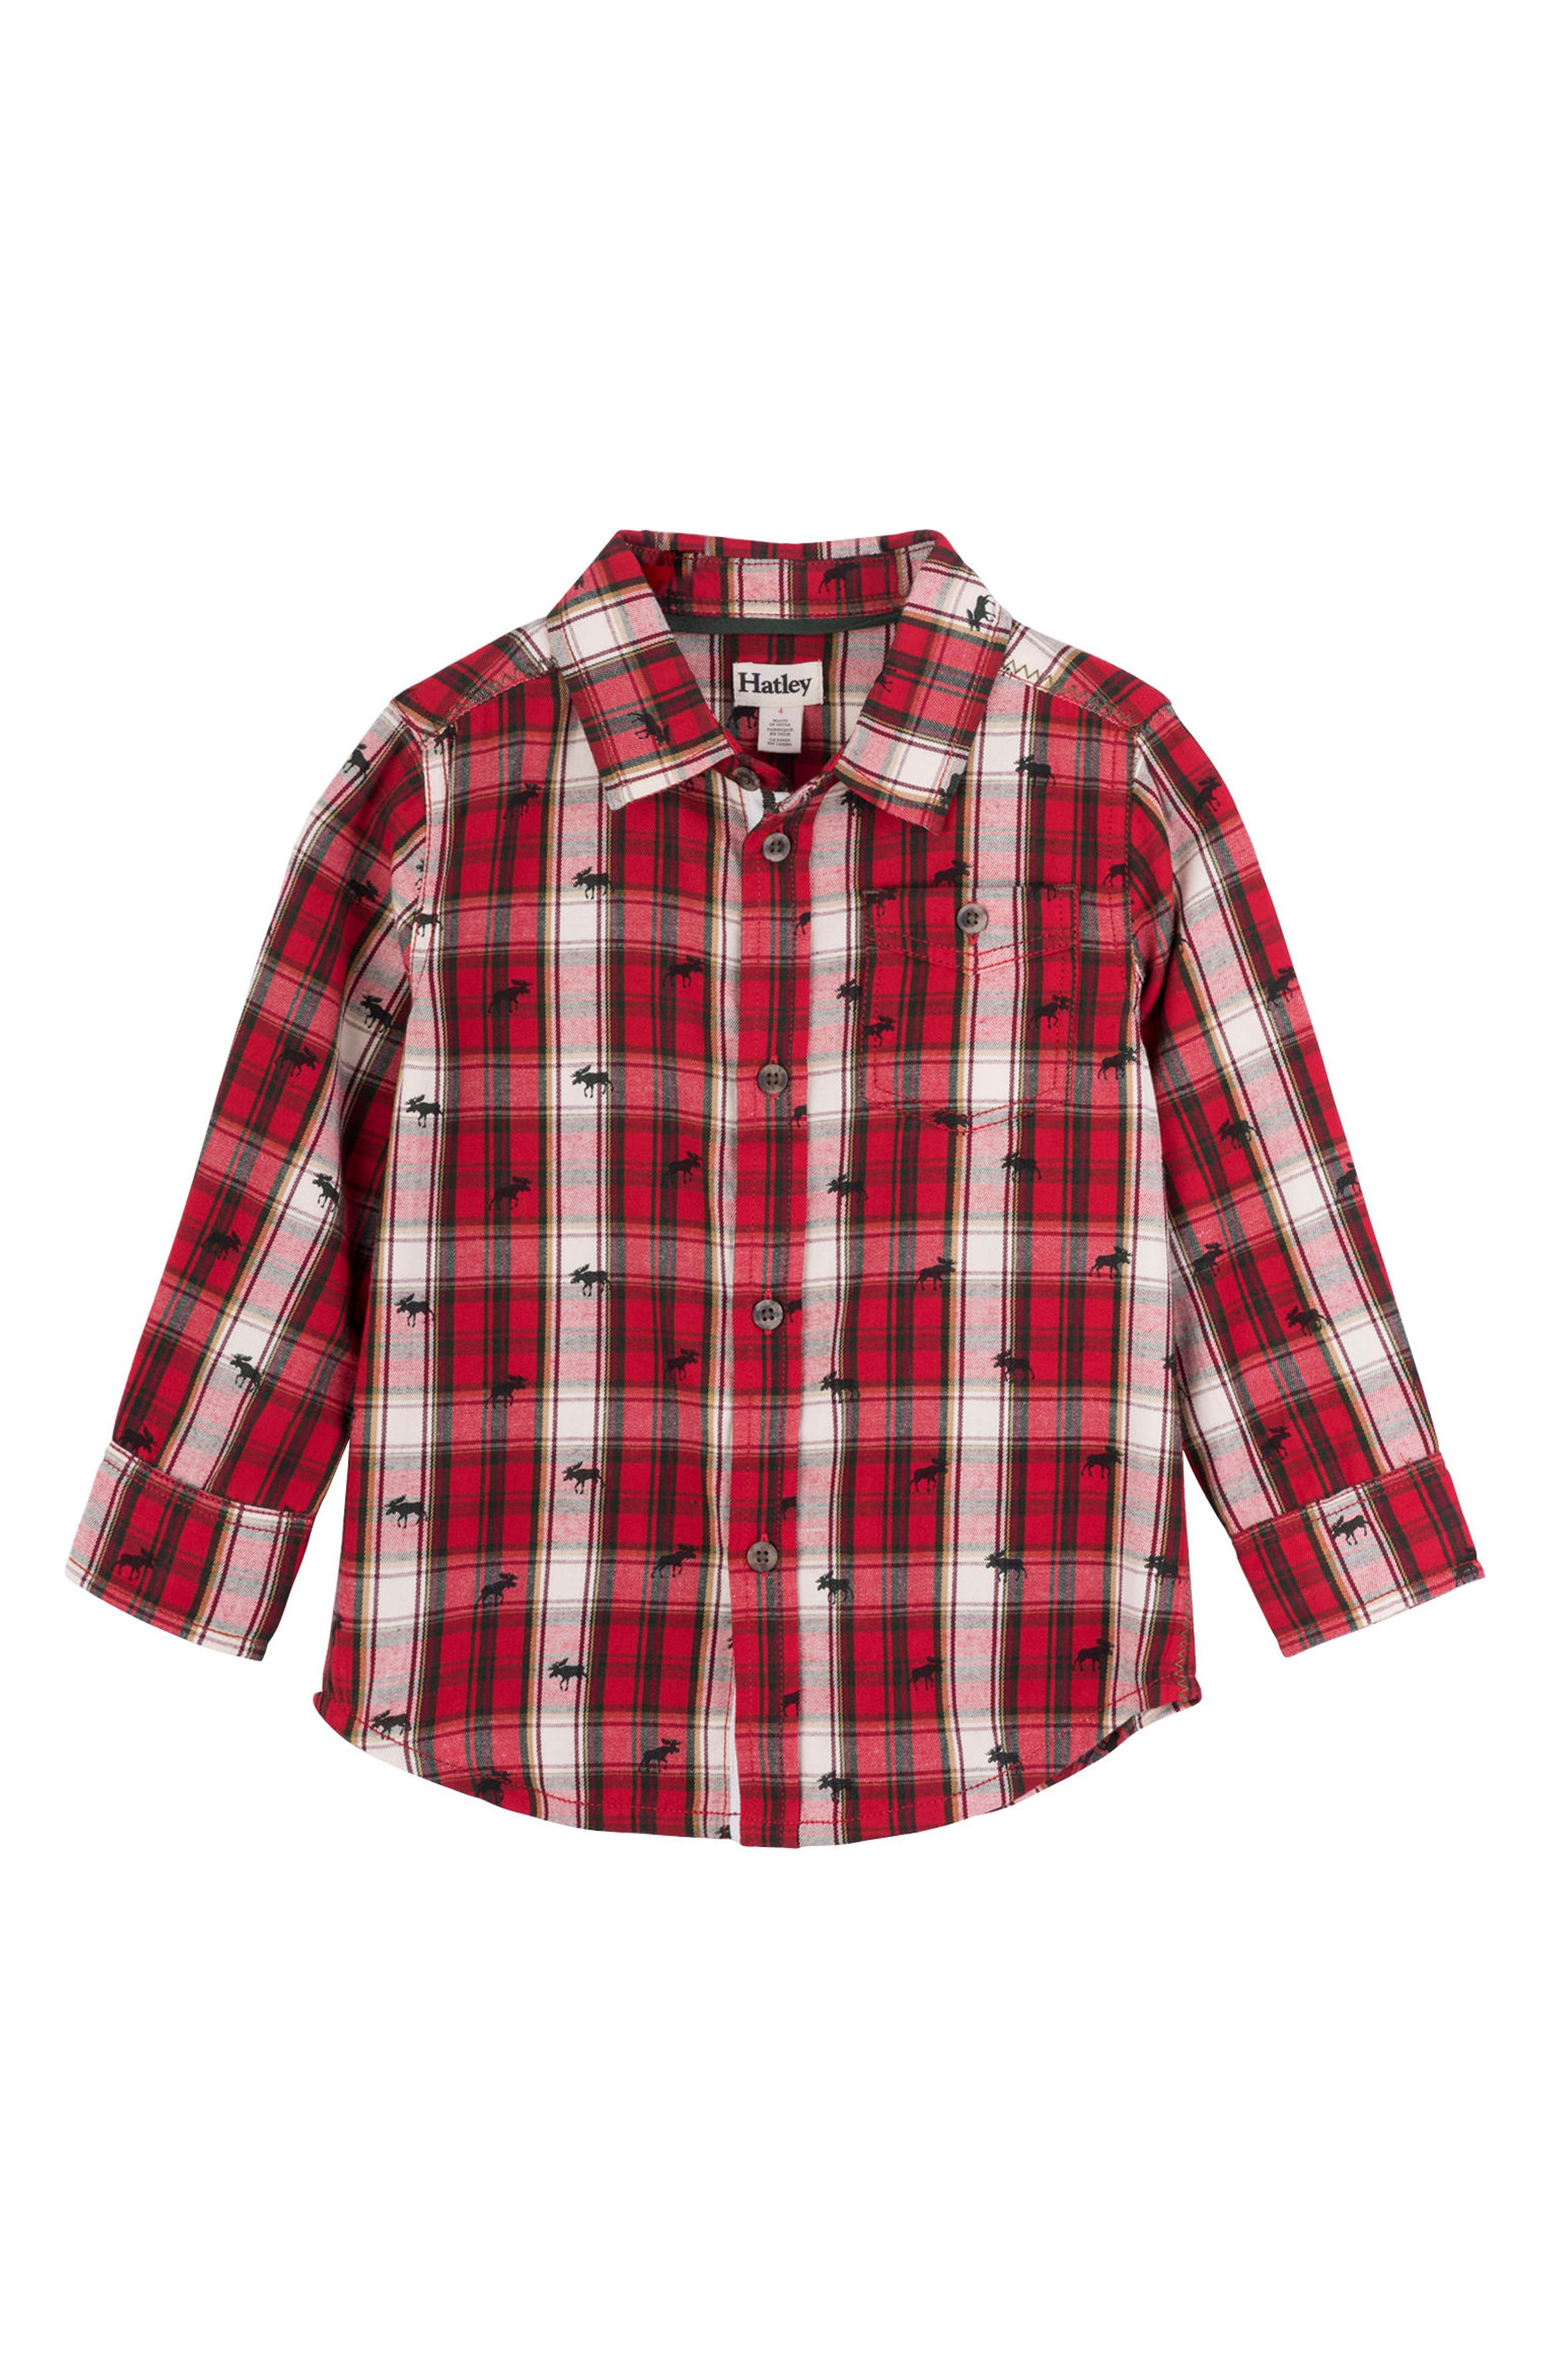 HATLEY Tiny Moose Plaid Woven Shirt, Main, color, RED